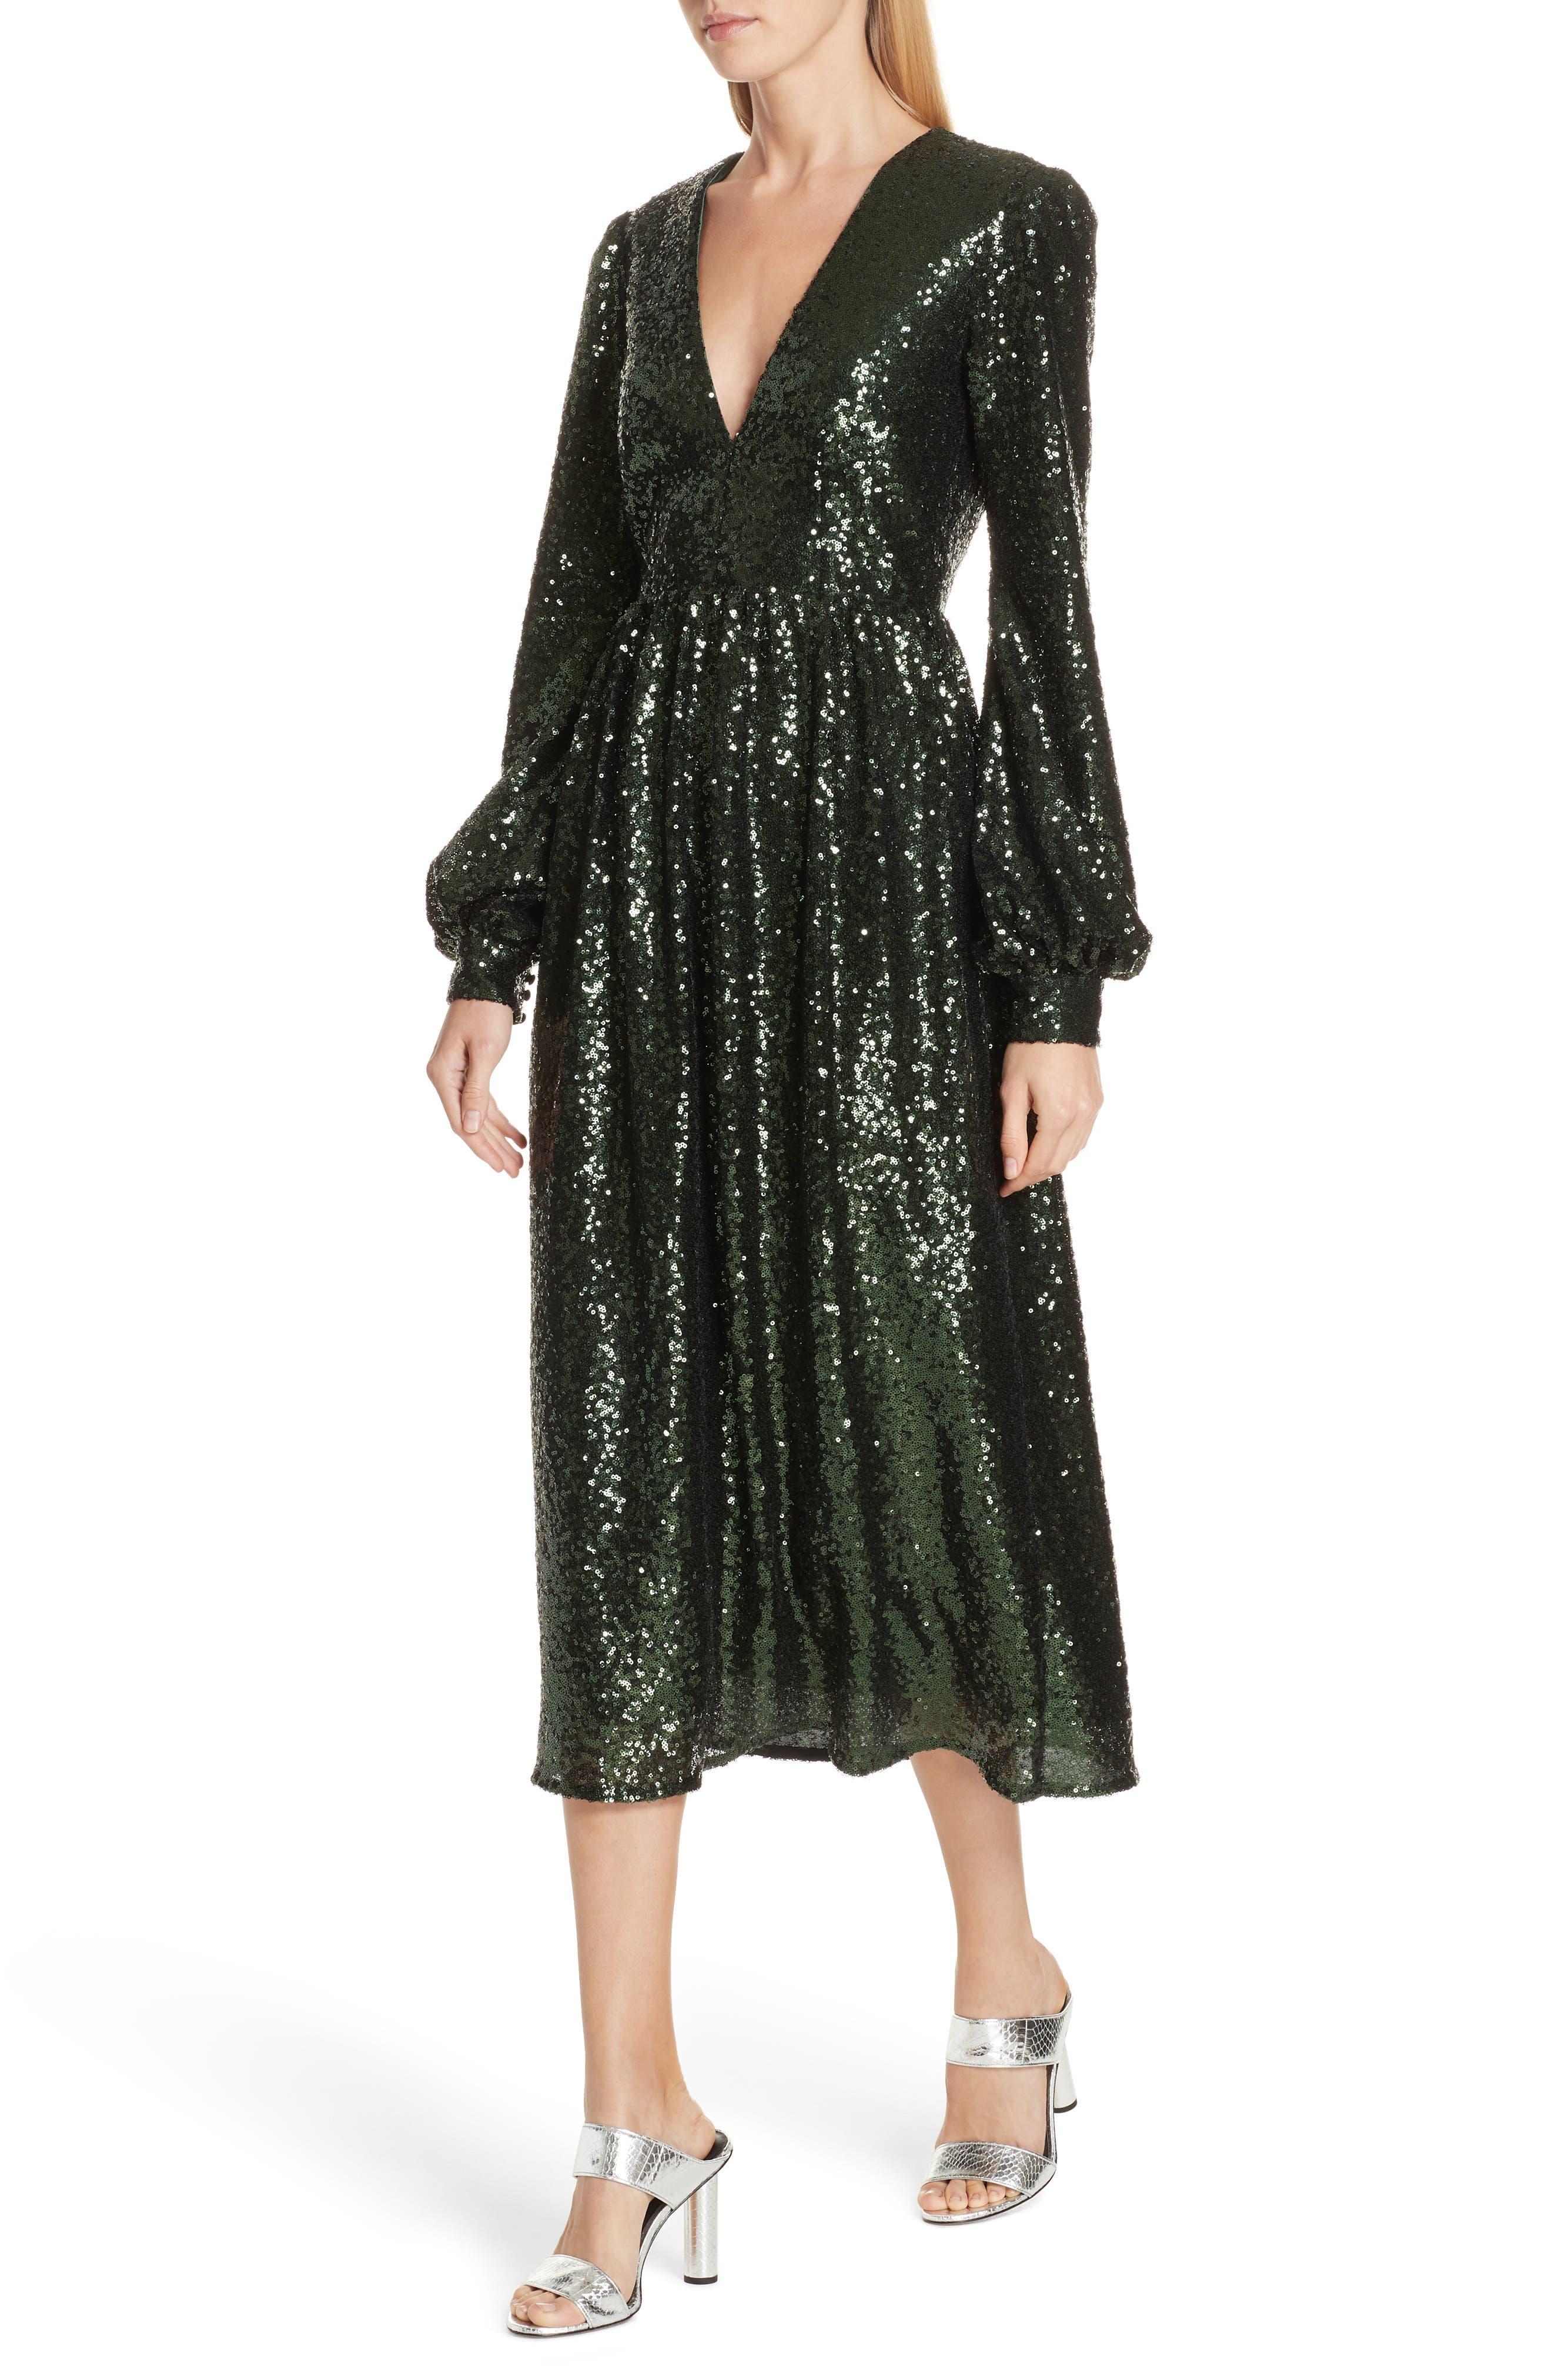 SALONI, Camille Sequin Midi Dress, Alternate thumbnail 5, color, DARK GREEN